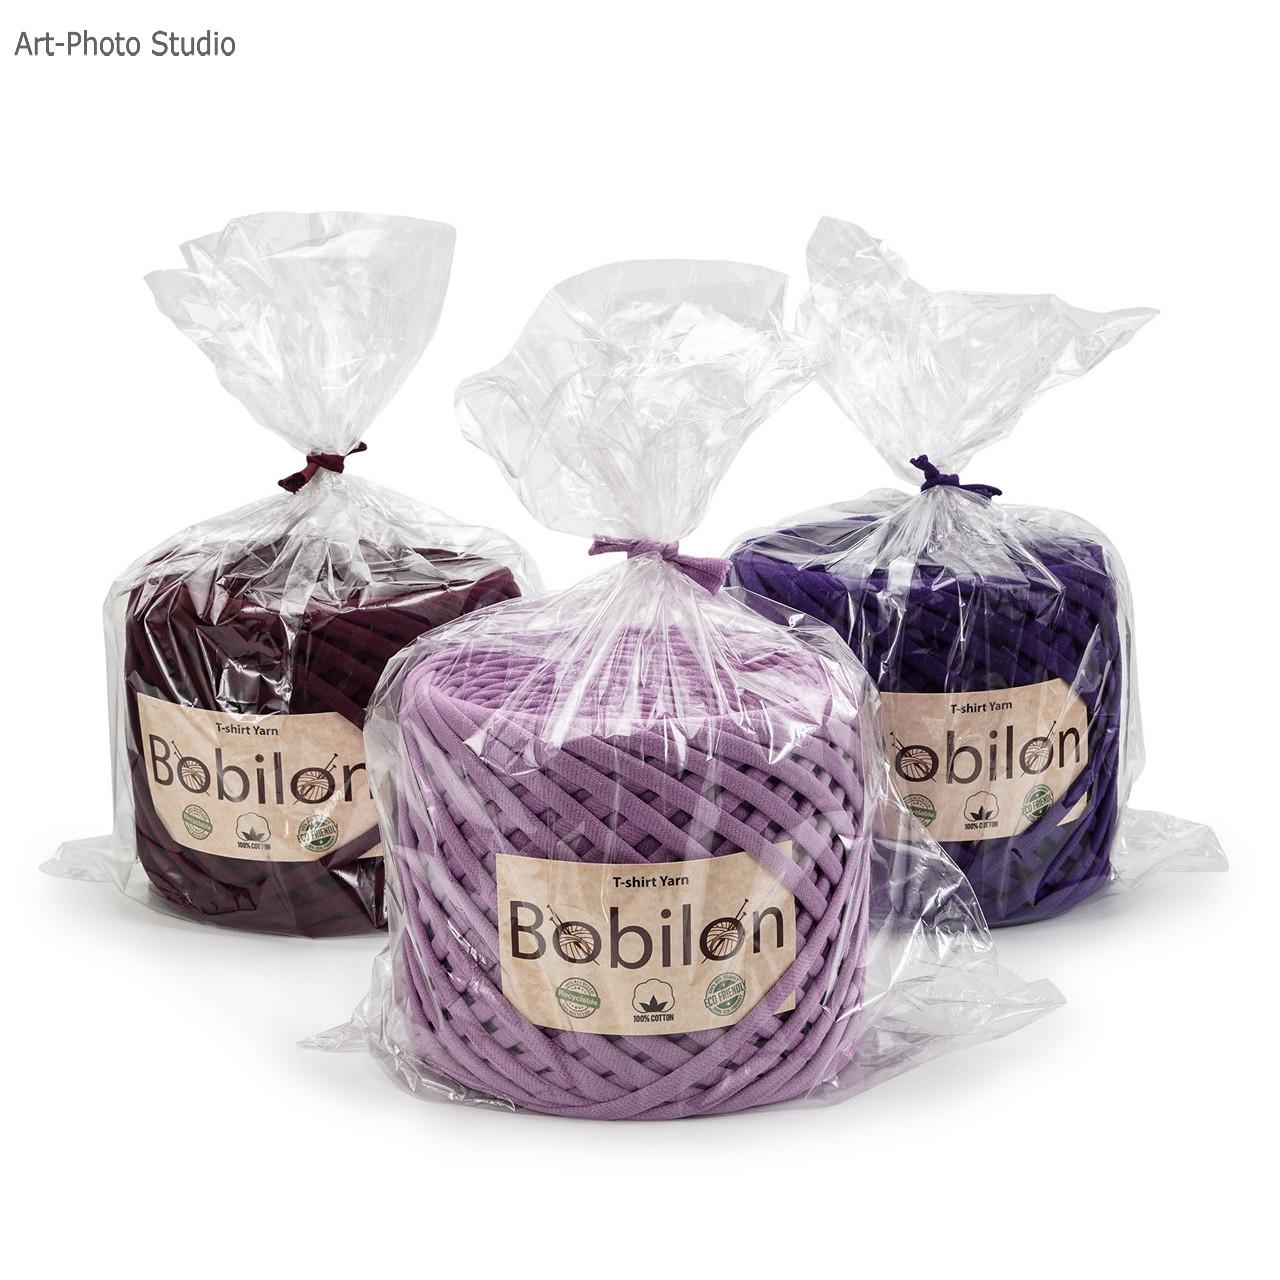 трикотажная пряжа Bobilon - фото для Amazon